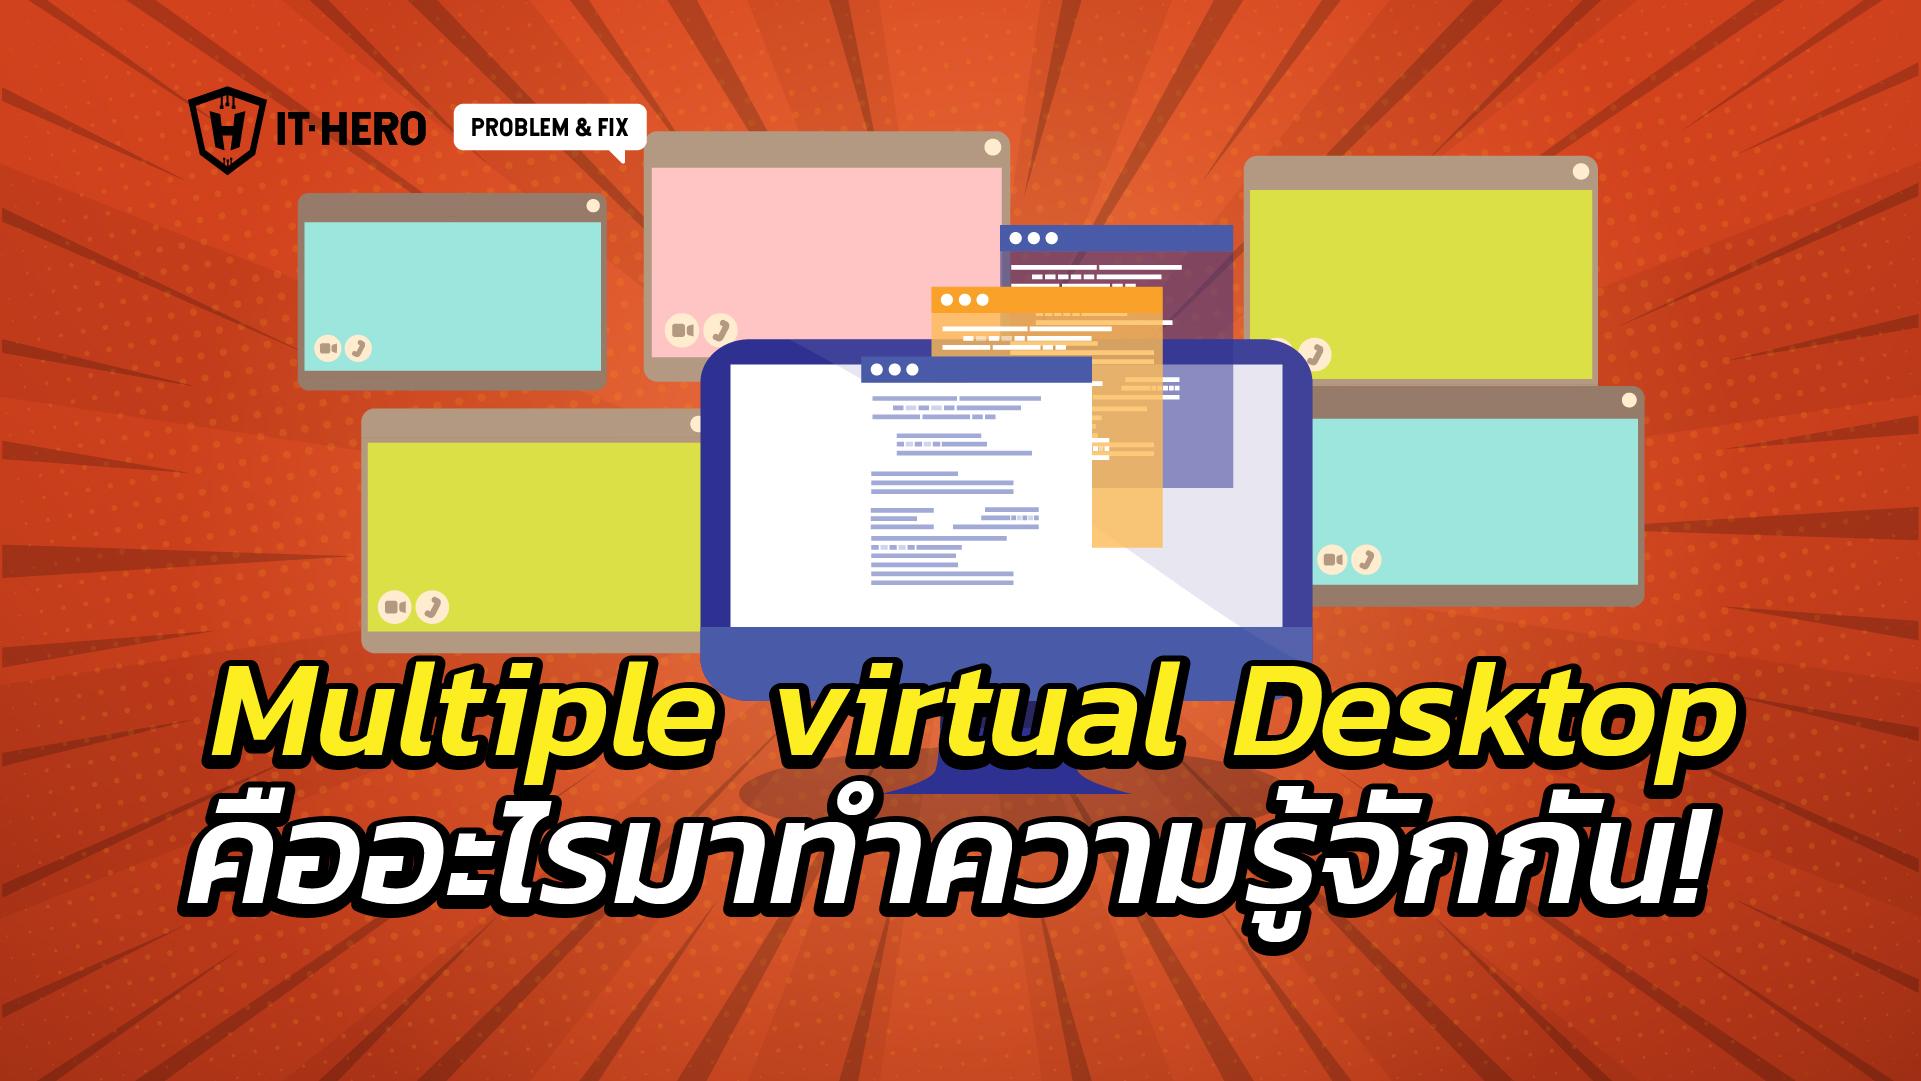 multiple virtual Desktop ใน windows10 คืออะไรเรามาทำความรู้จักกันเลยครับ